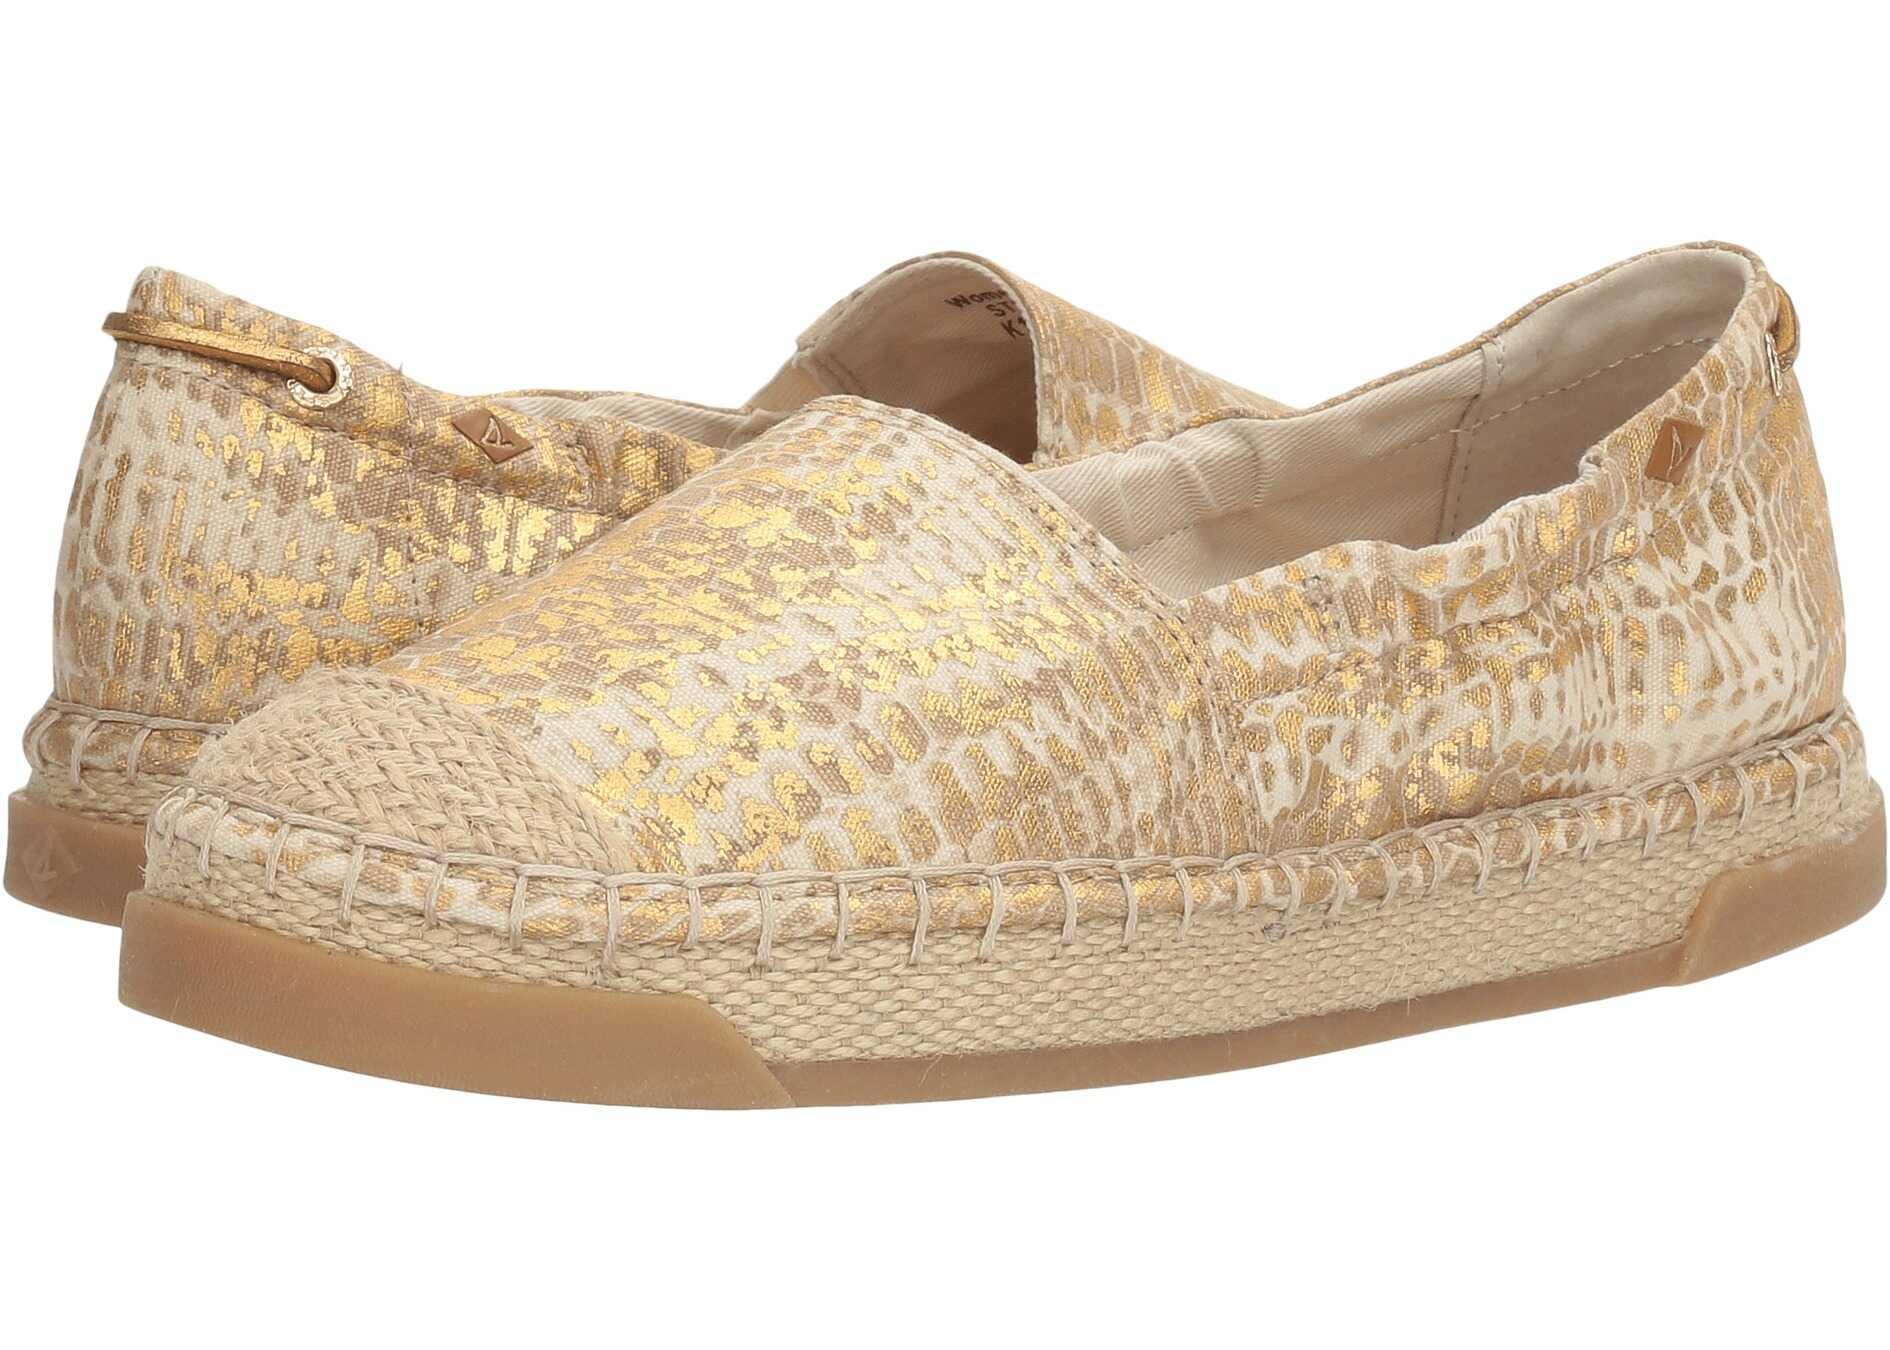 Sperry Top-Sider Laurel Reef Prints Linen/Gold Python